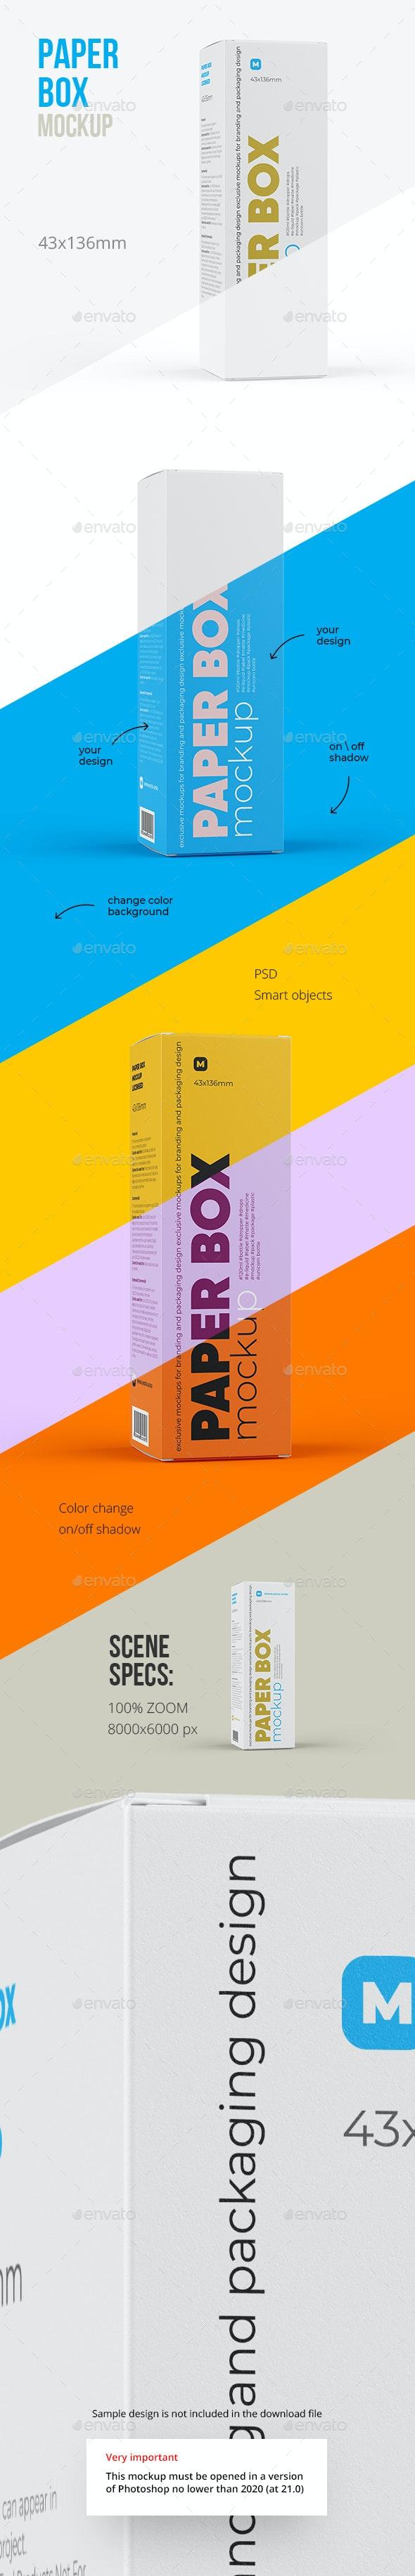 Paper Box Mockup 43x136mm - Packaging Product Mock-Ups